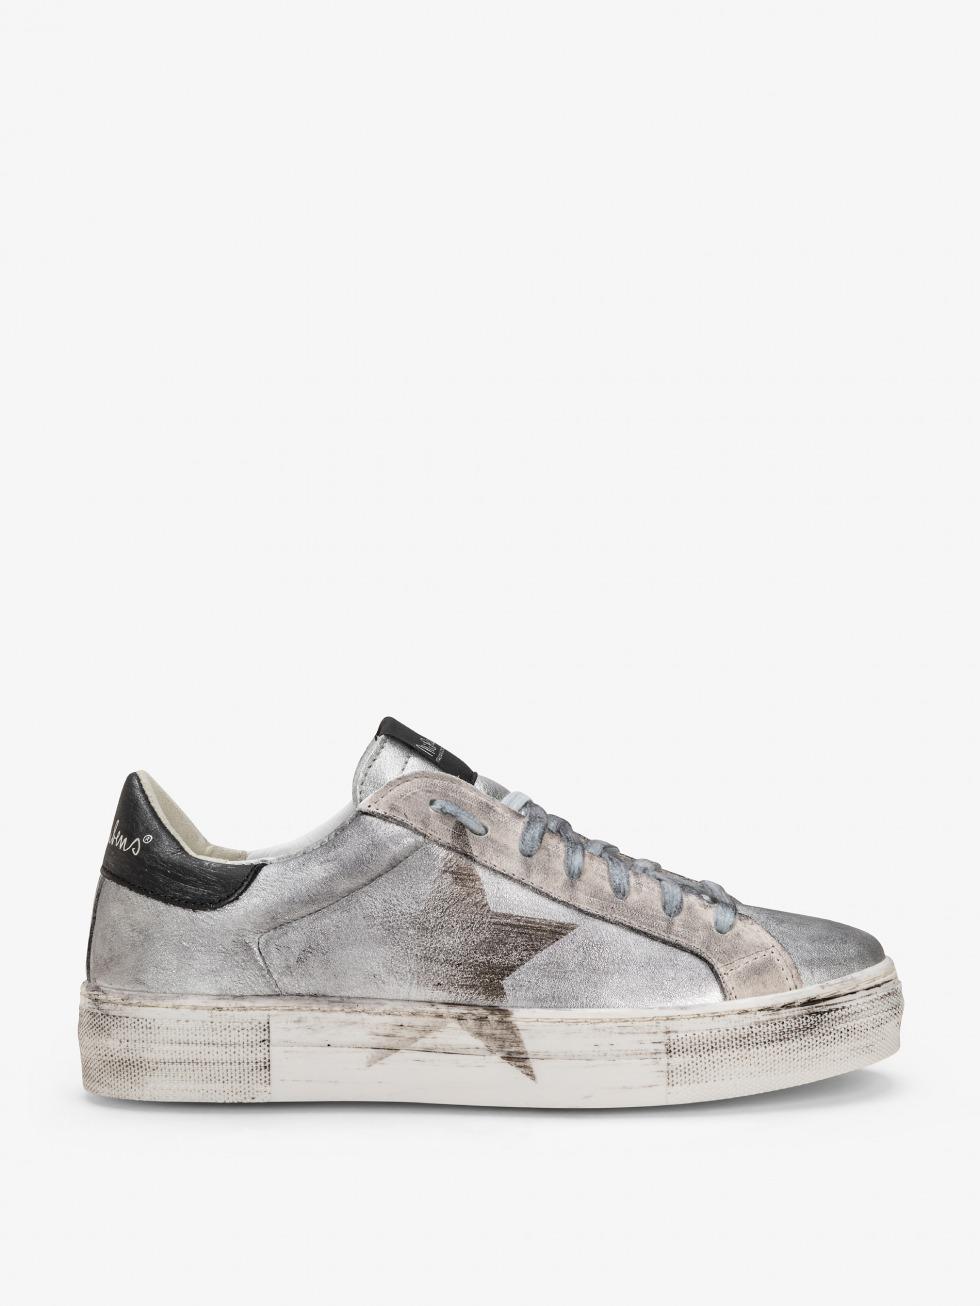 sneakers-in-pelle-donna-martini-vintage-silver-stella